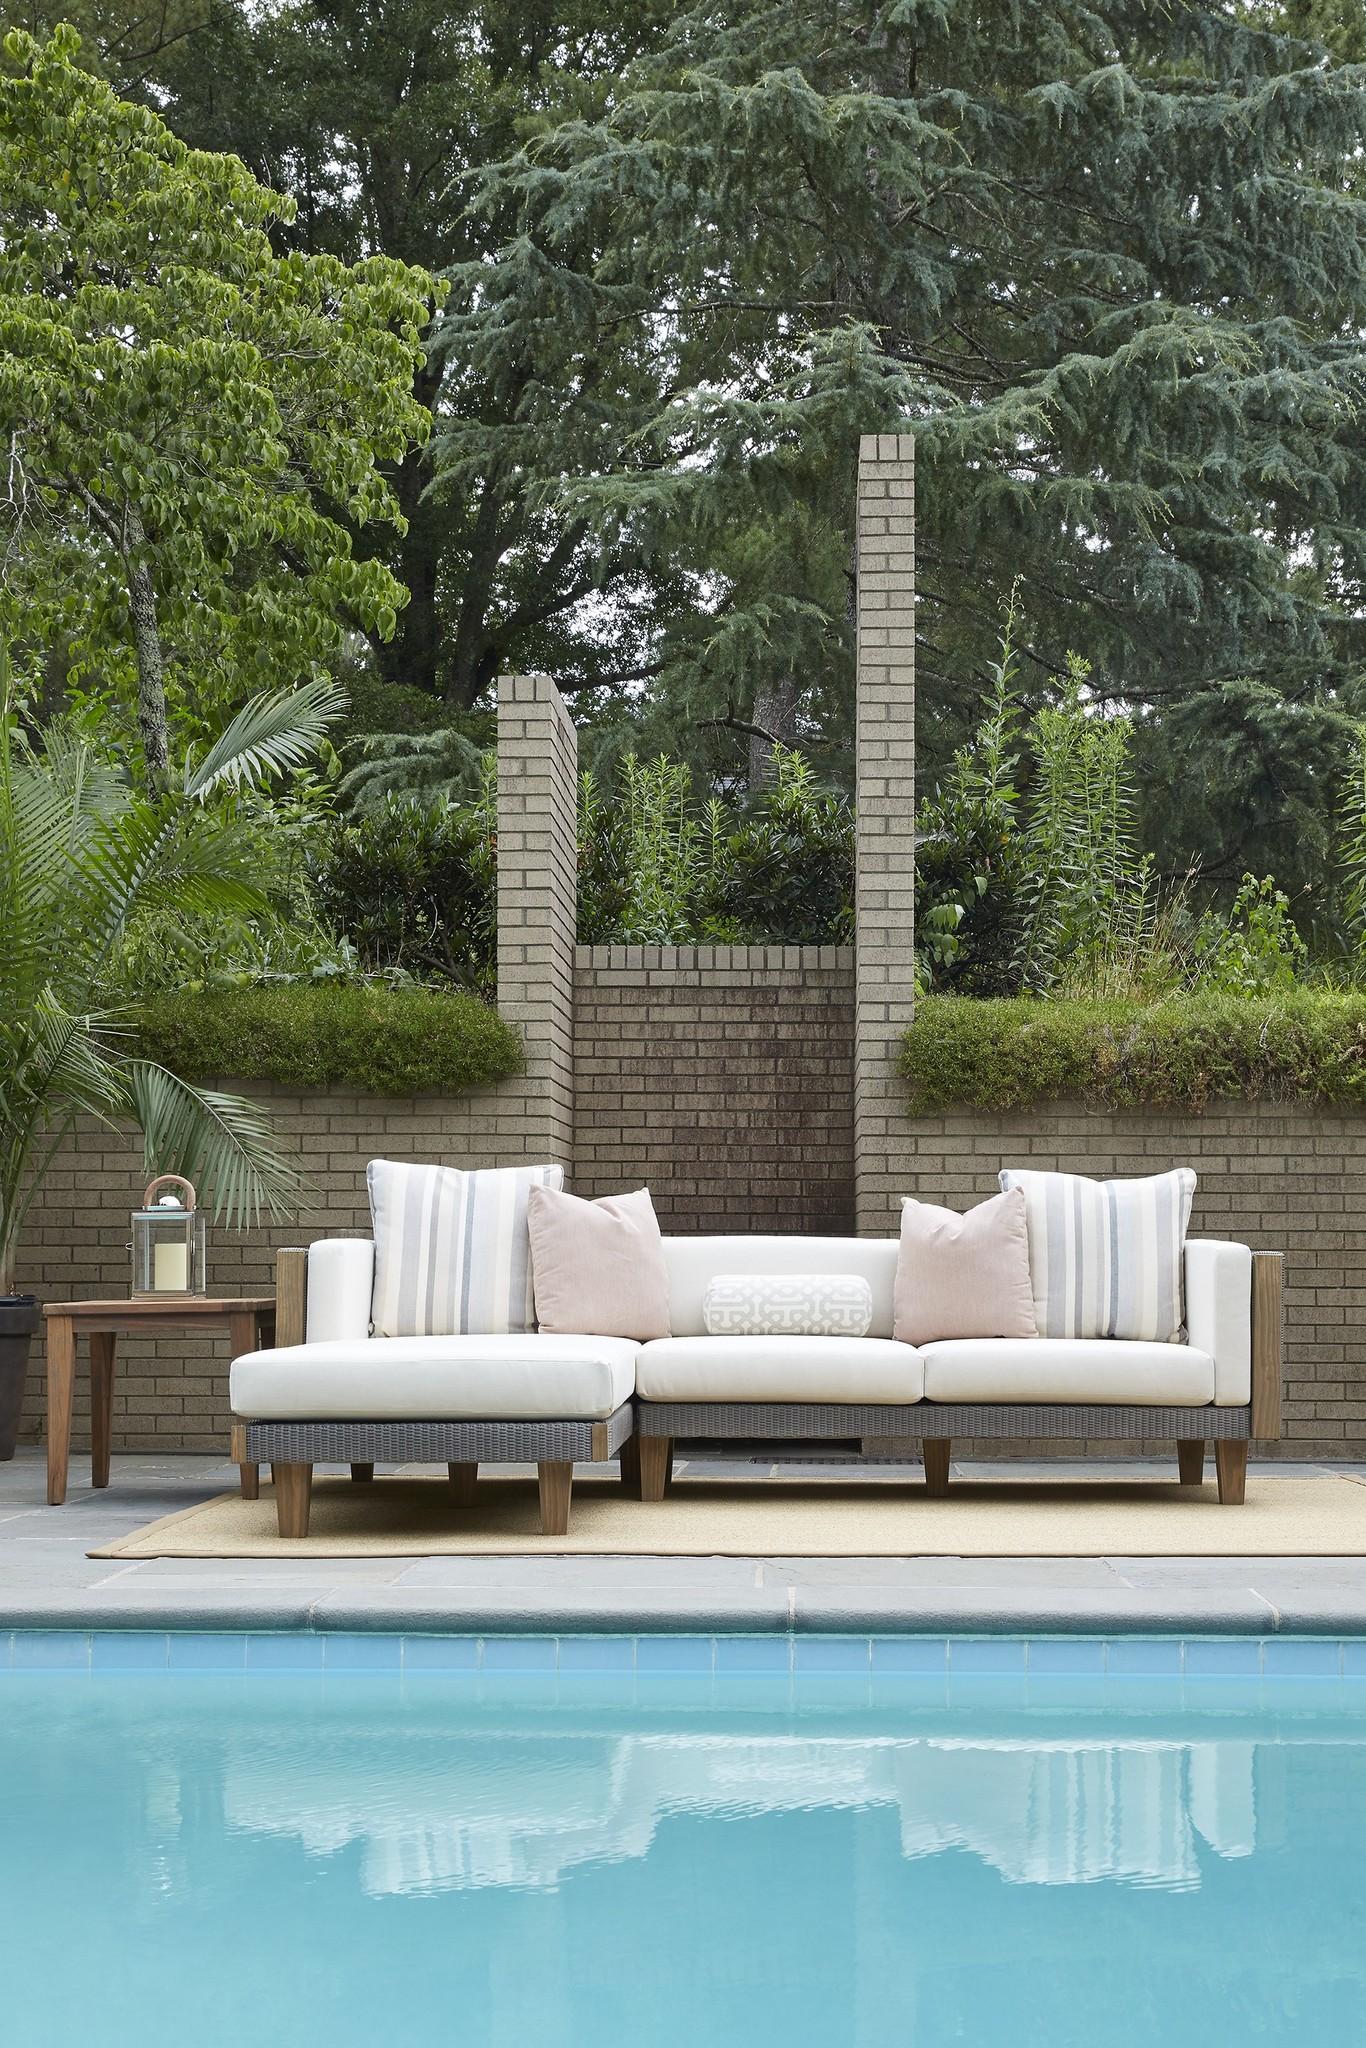 Luxury Outdoor Furniture Showcase